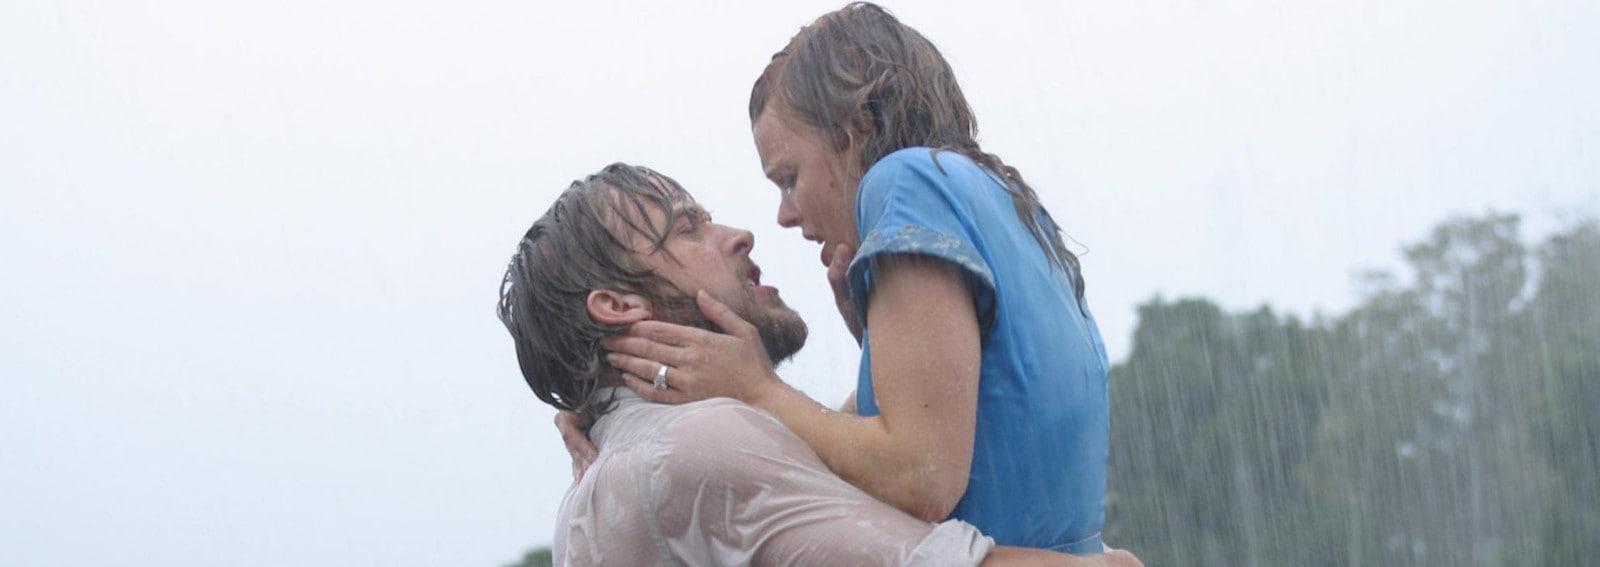 Ryan Gosling pioggia